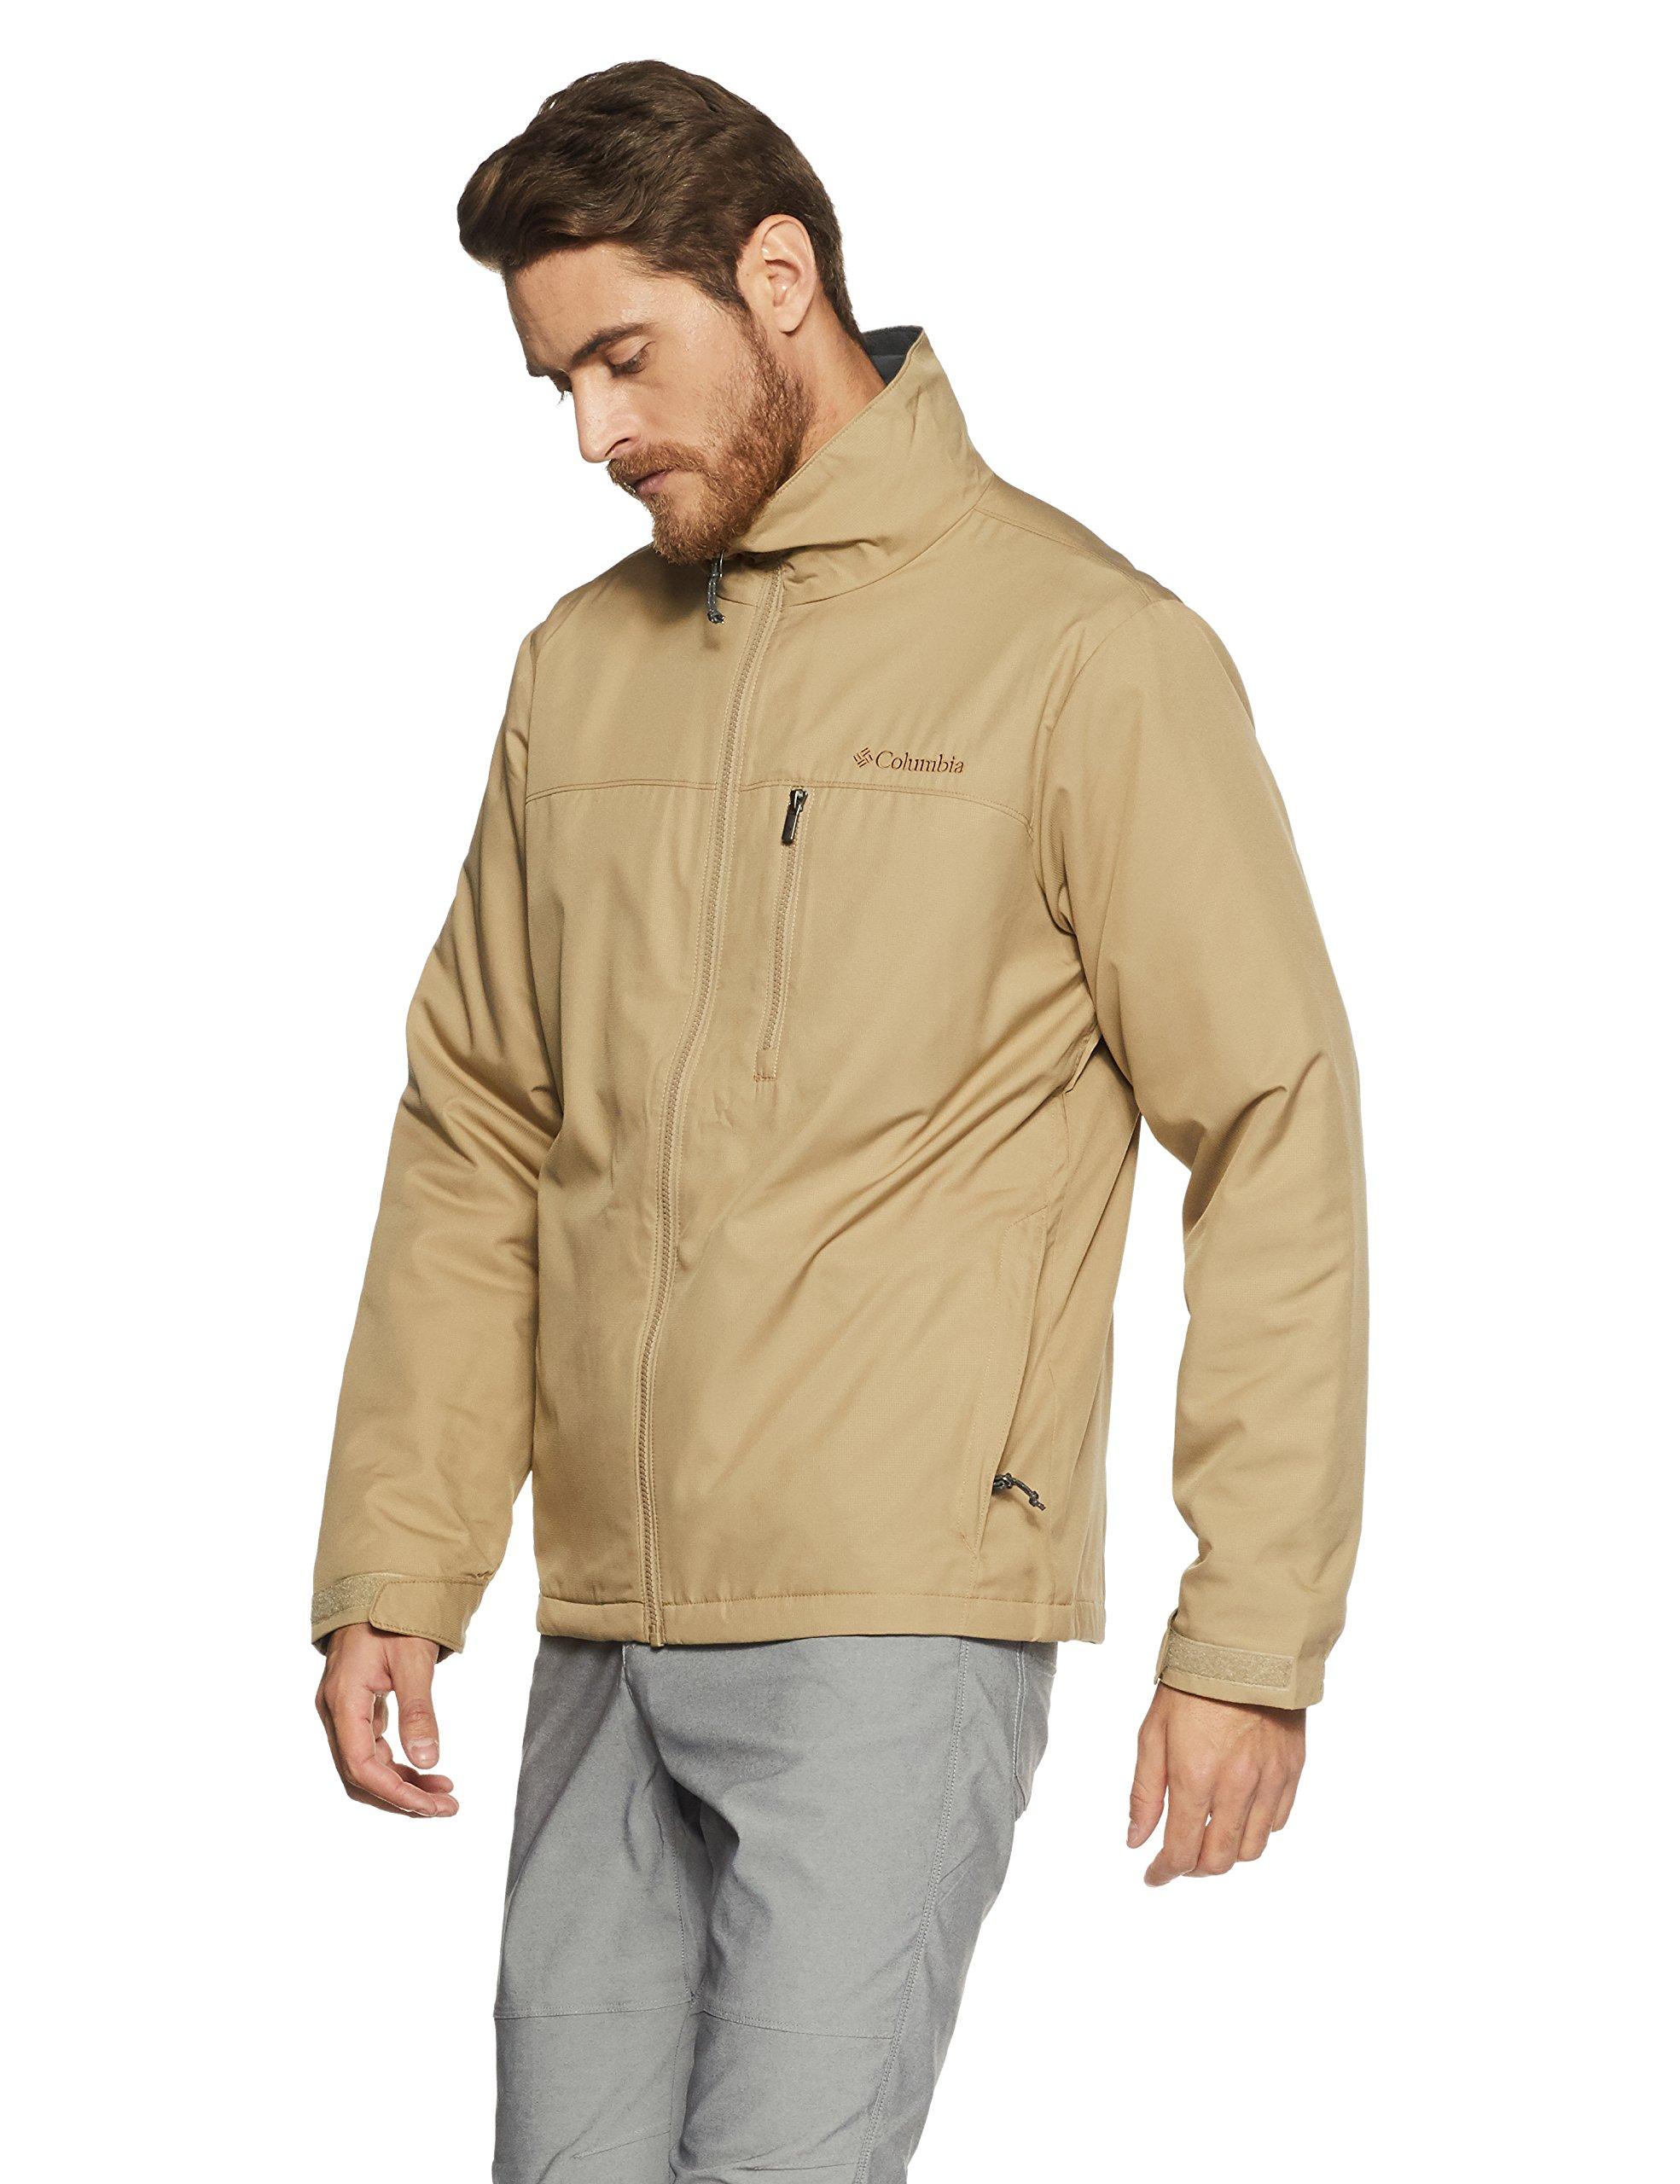 Columbia Men's Utilizer Jacket, British Tan, Medium by Columbia